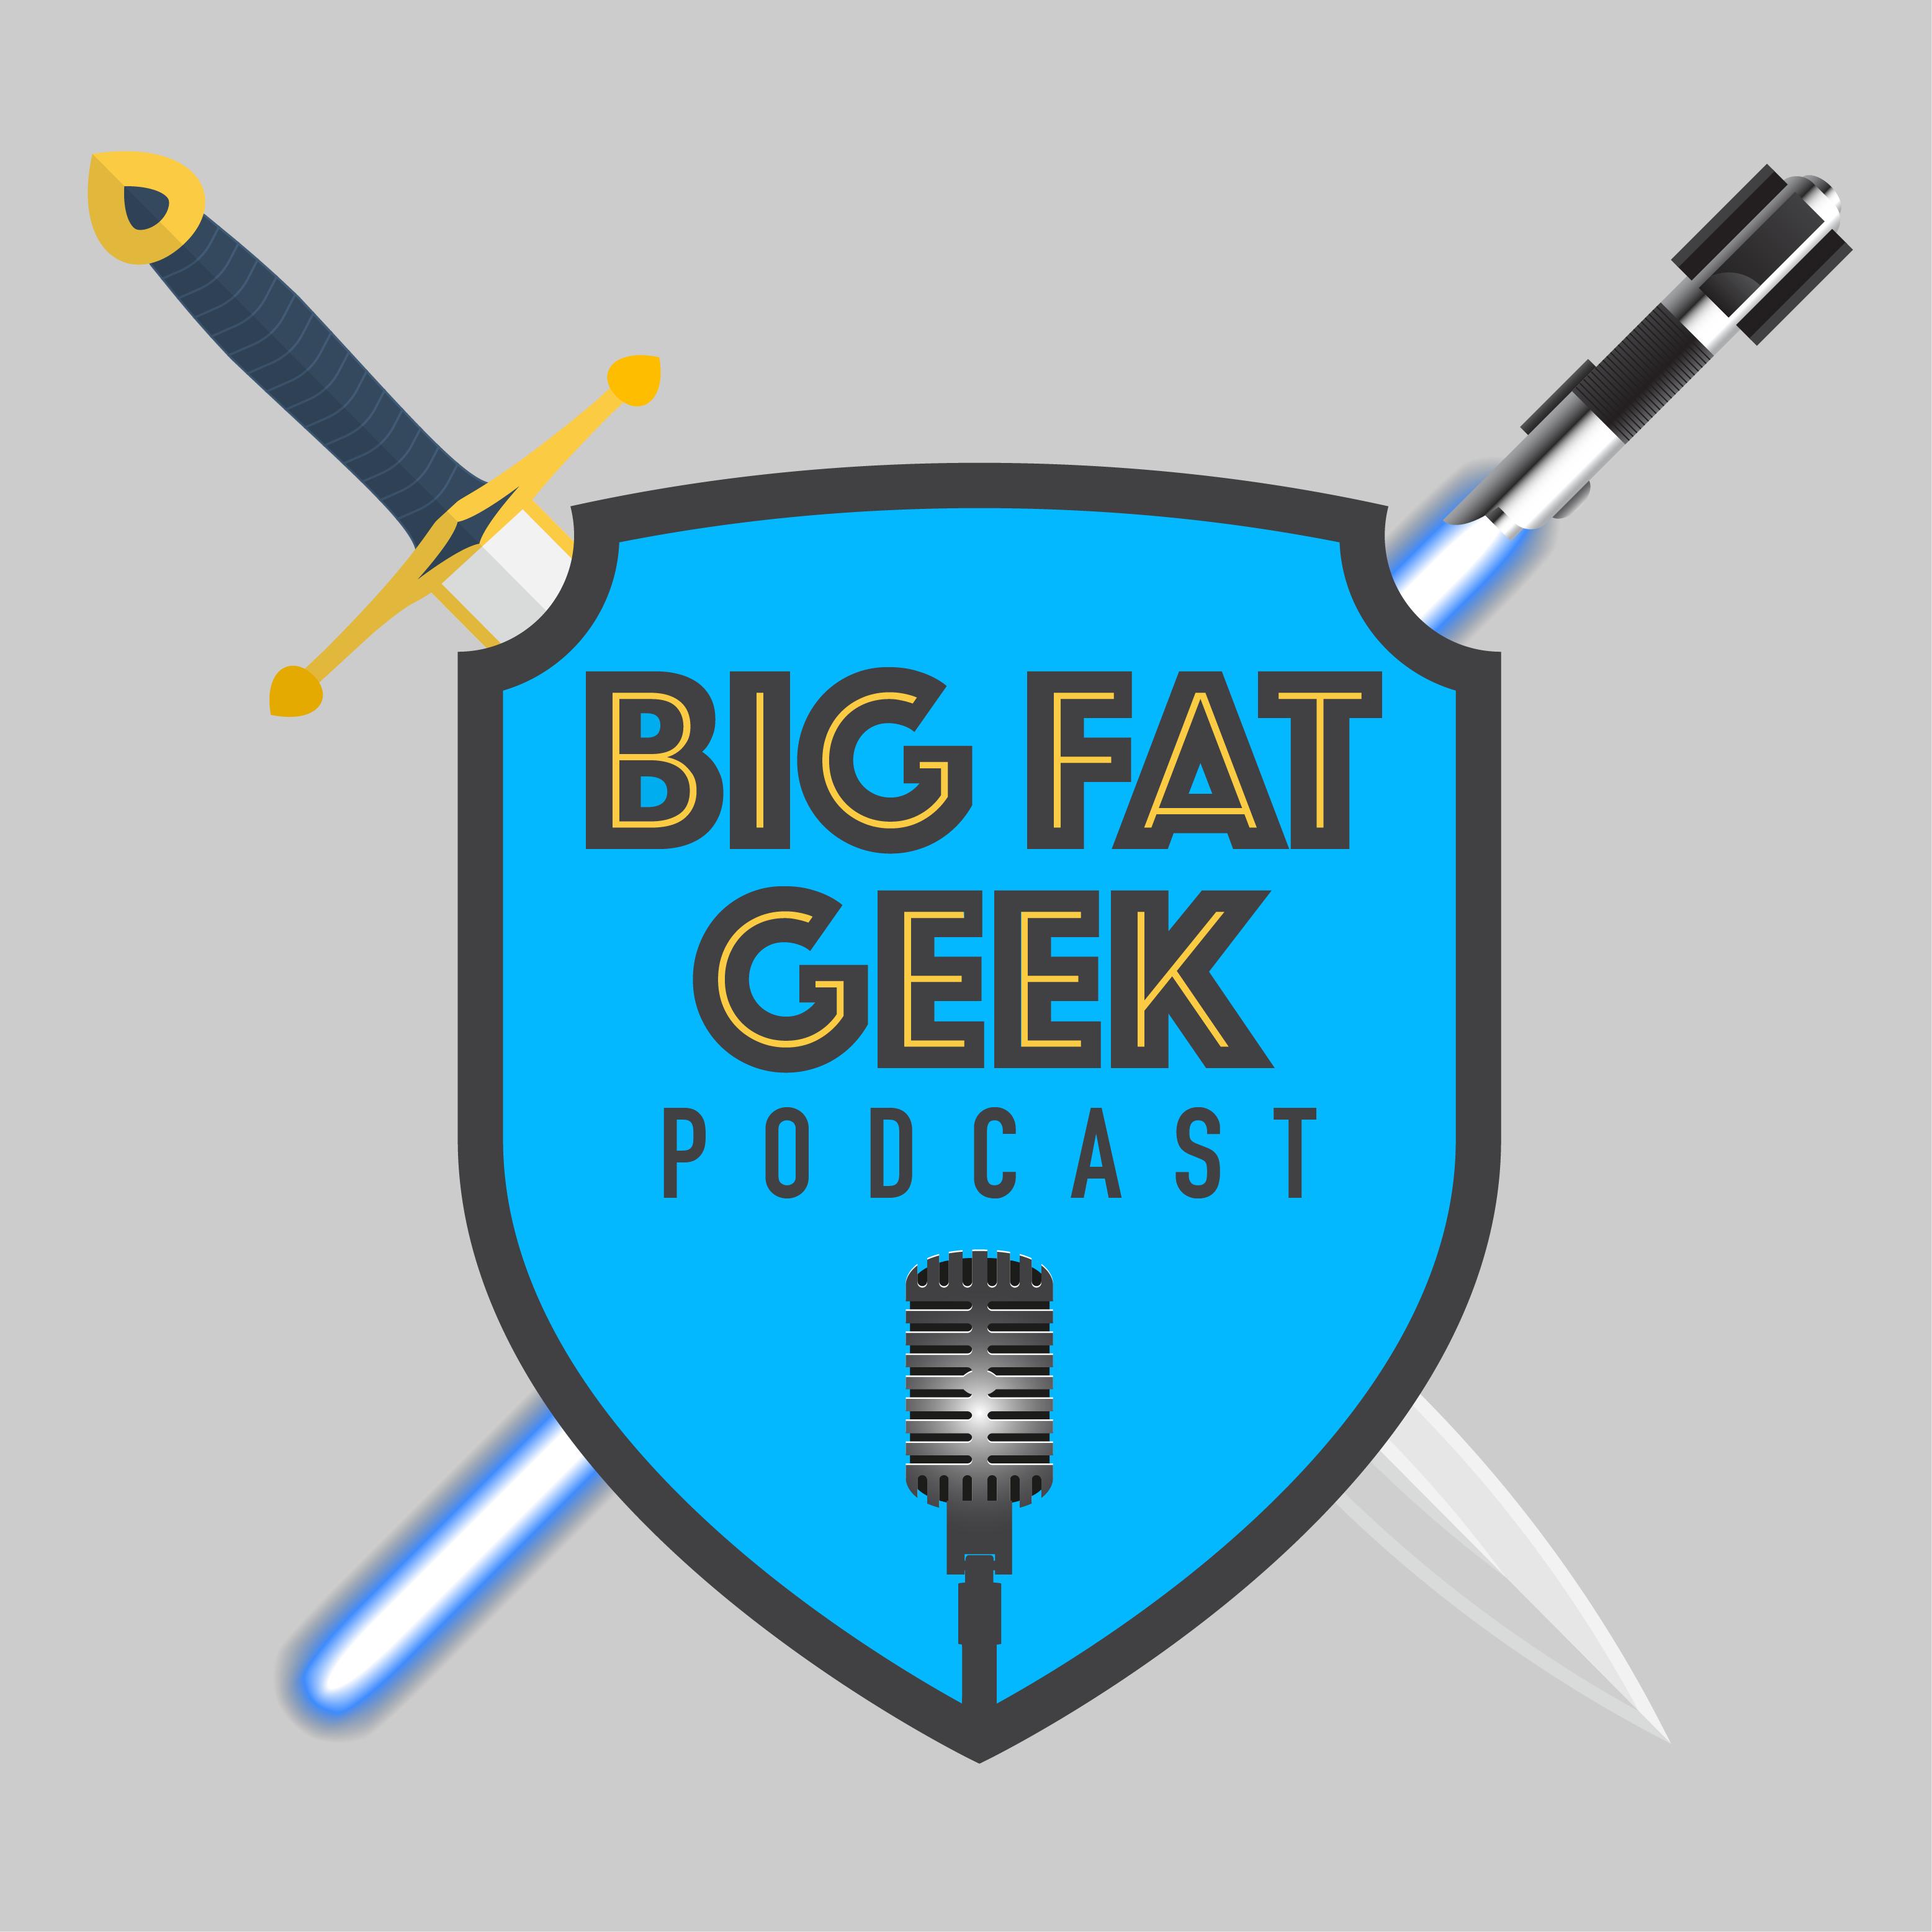 Big Fat Geek Podcast show art